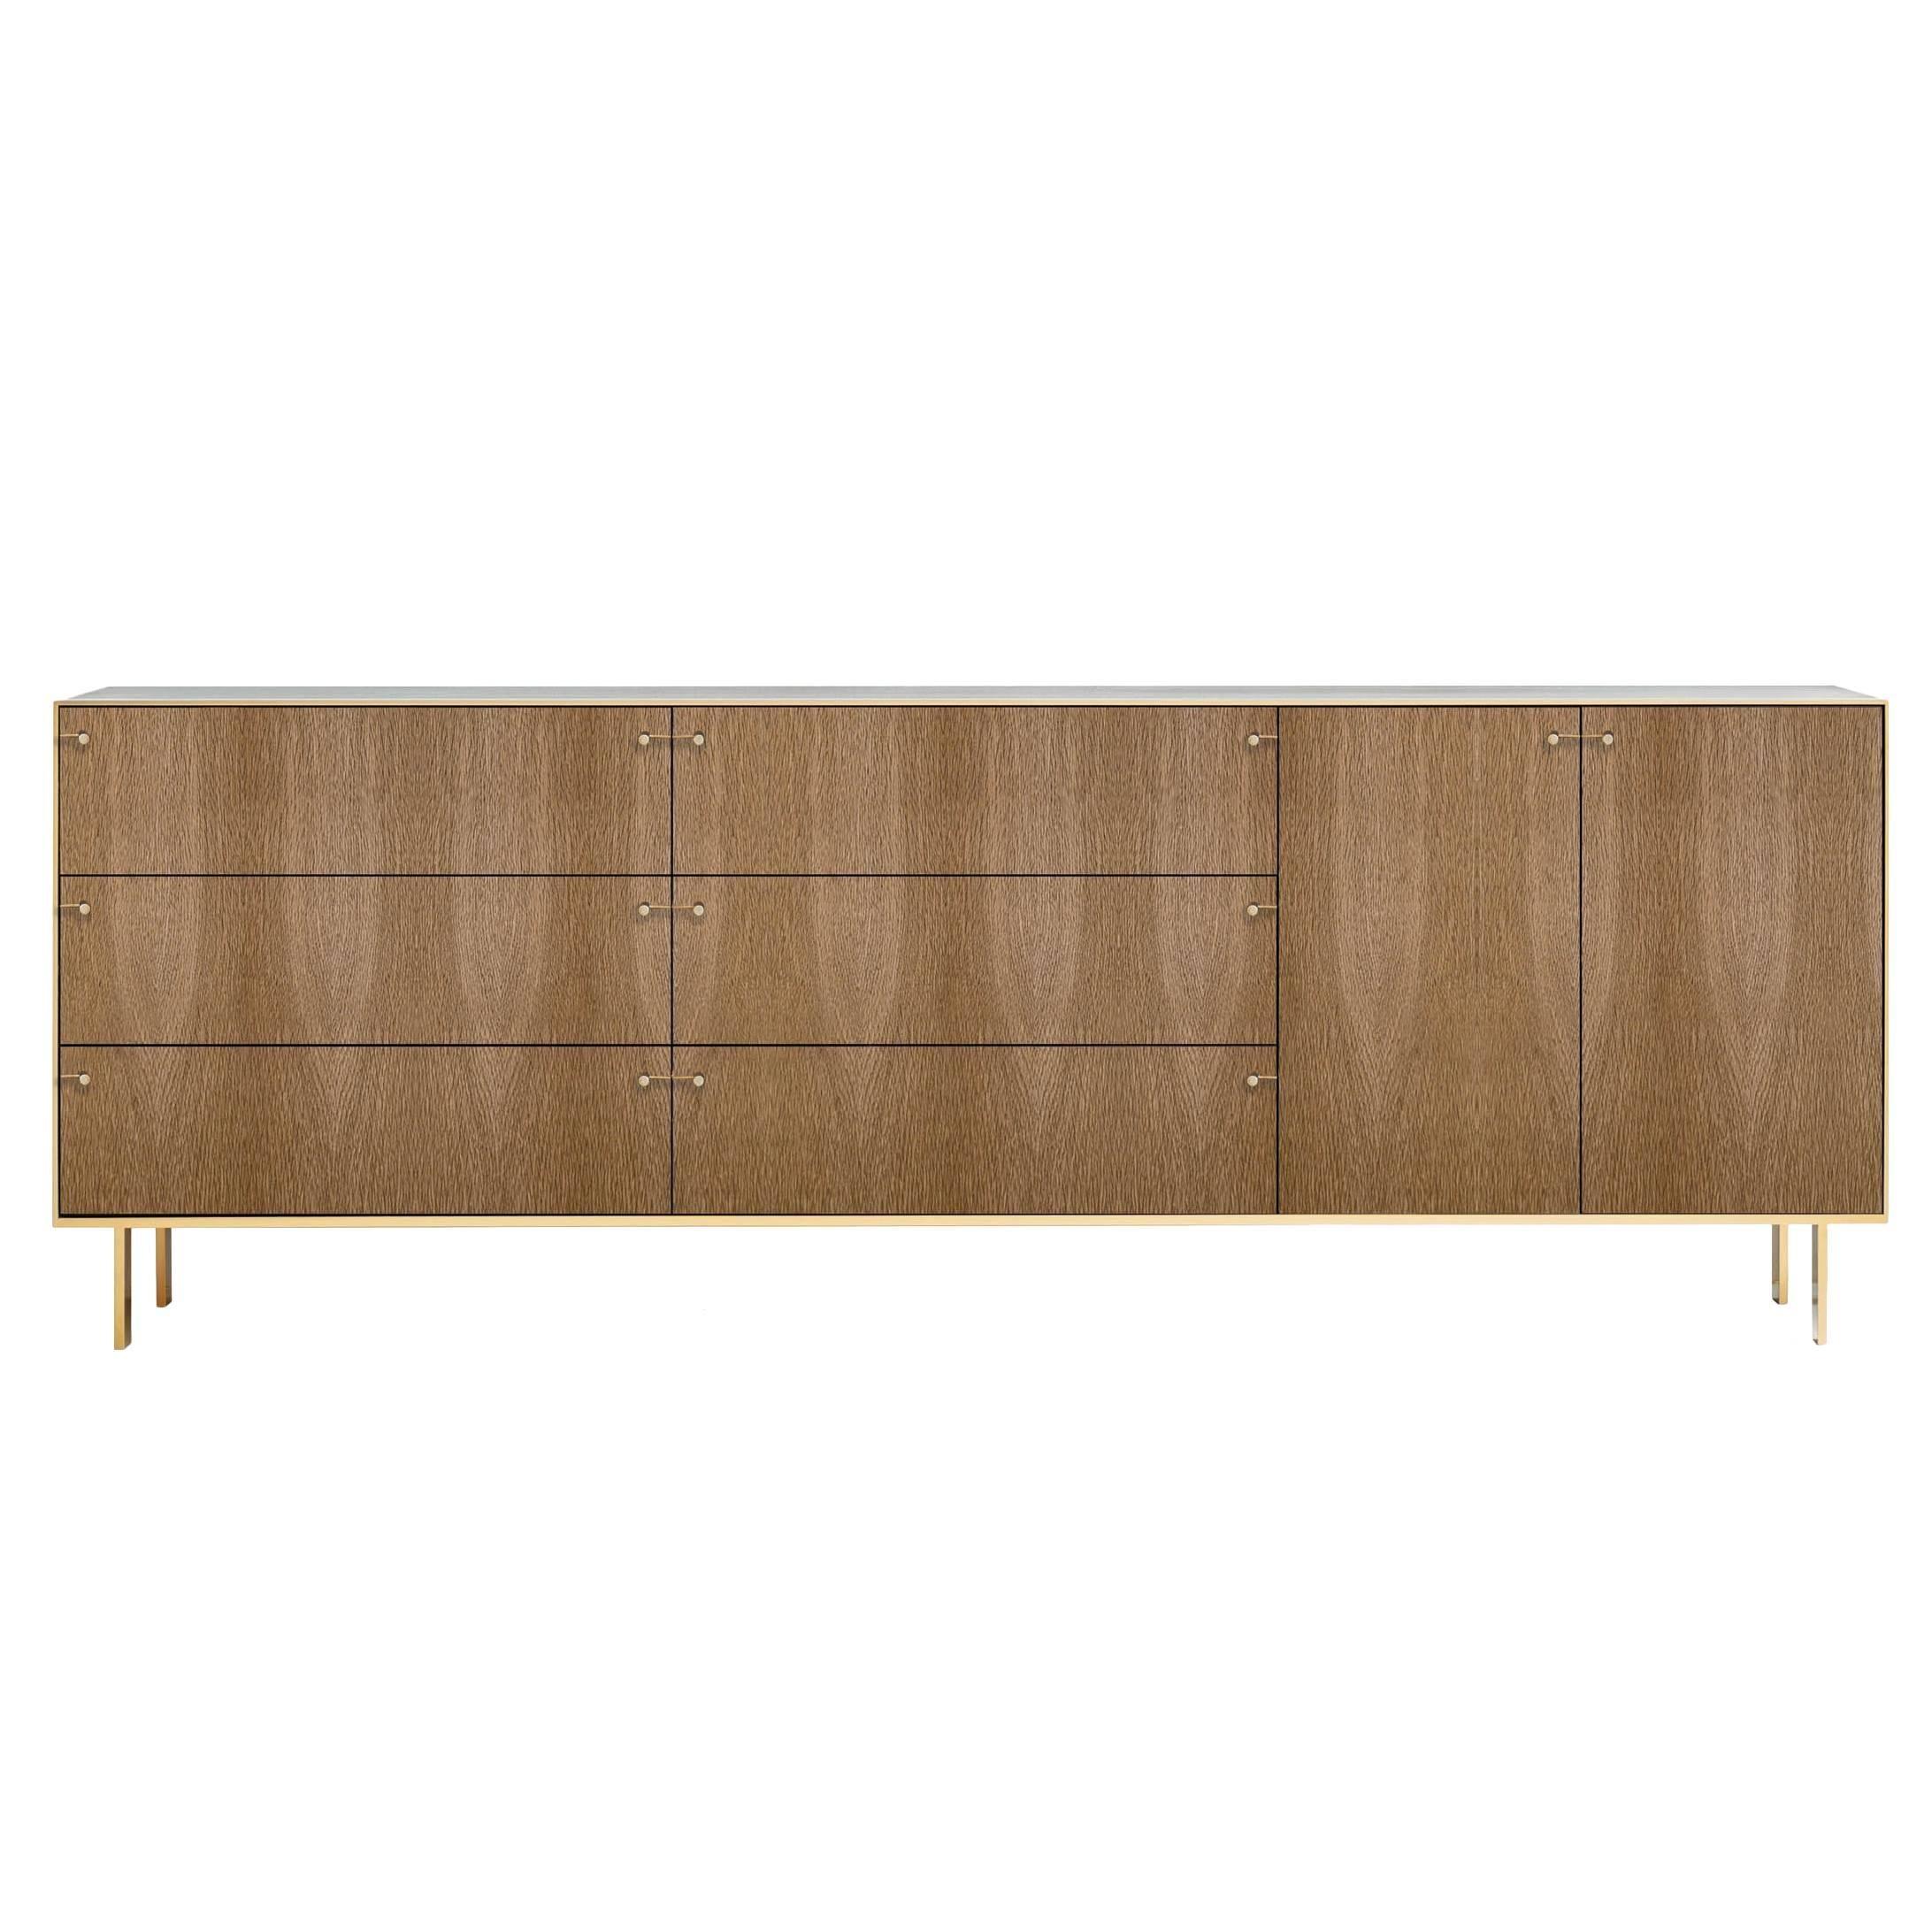 Ingemar Cabinet - Long (or Dresser or Sideboard or Buffet) in Oak and Bronze